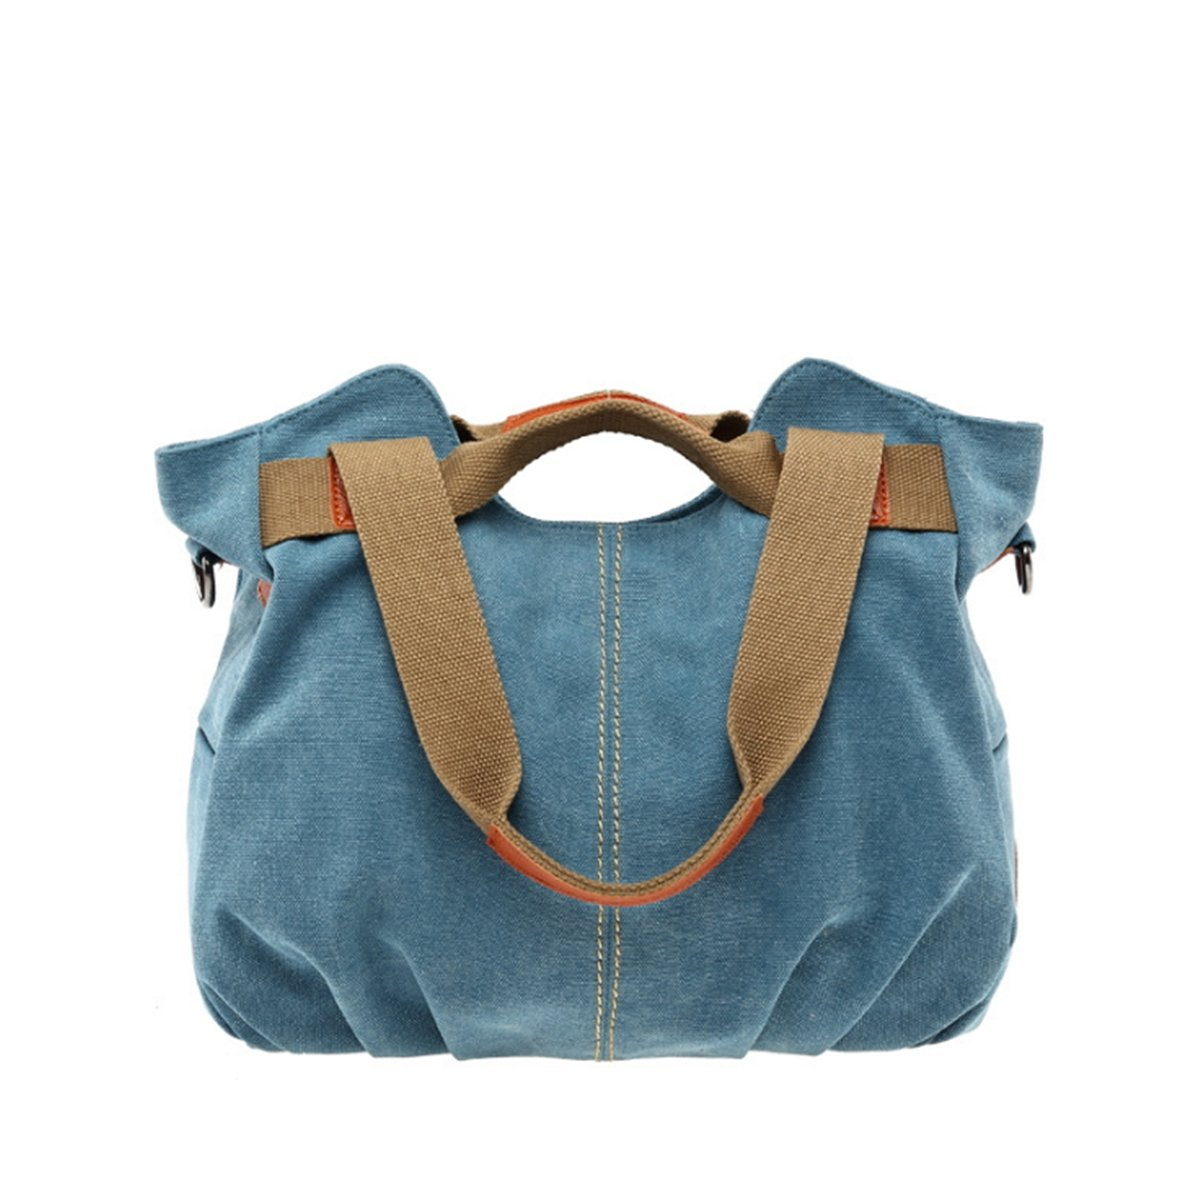 JSBKY Women's Ladies Vintage Casual Hobo Canvas Daily Purse Top Handle Shoulder Tote Shopper Handbag (blue)